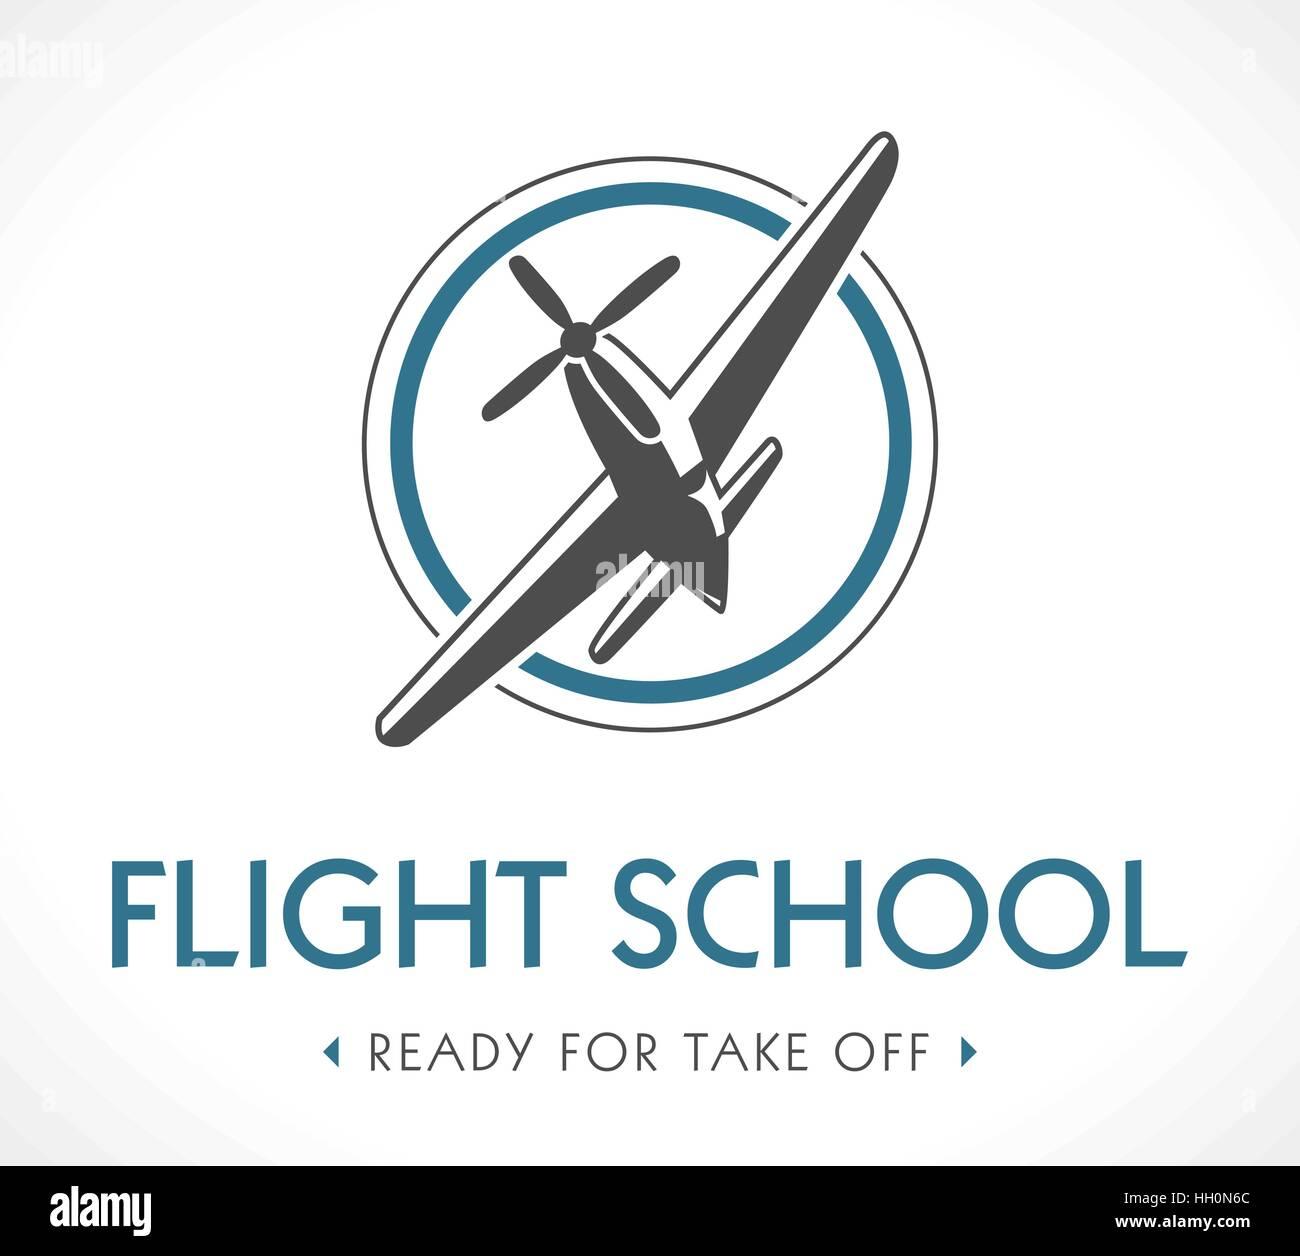 Flight school logo - Stock Image